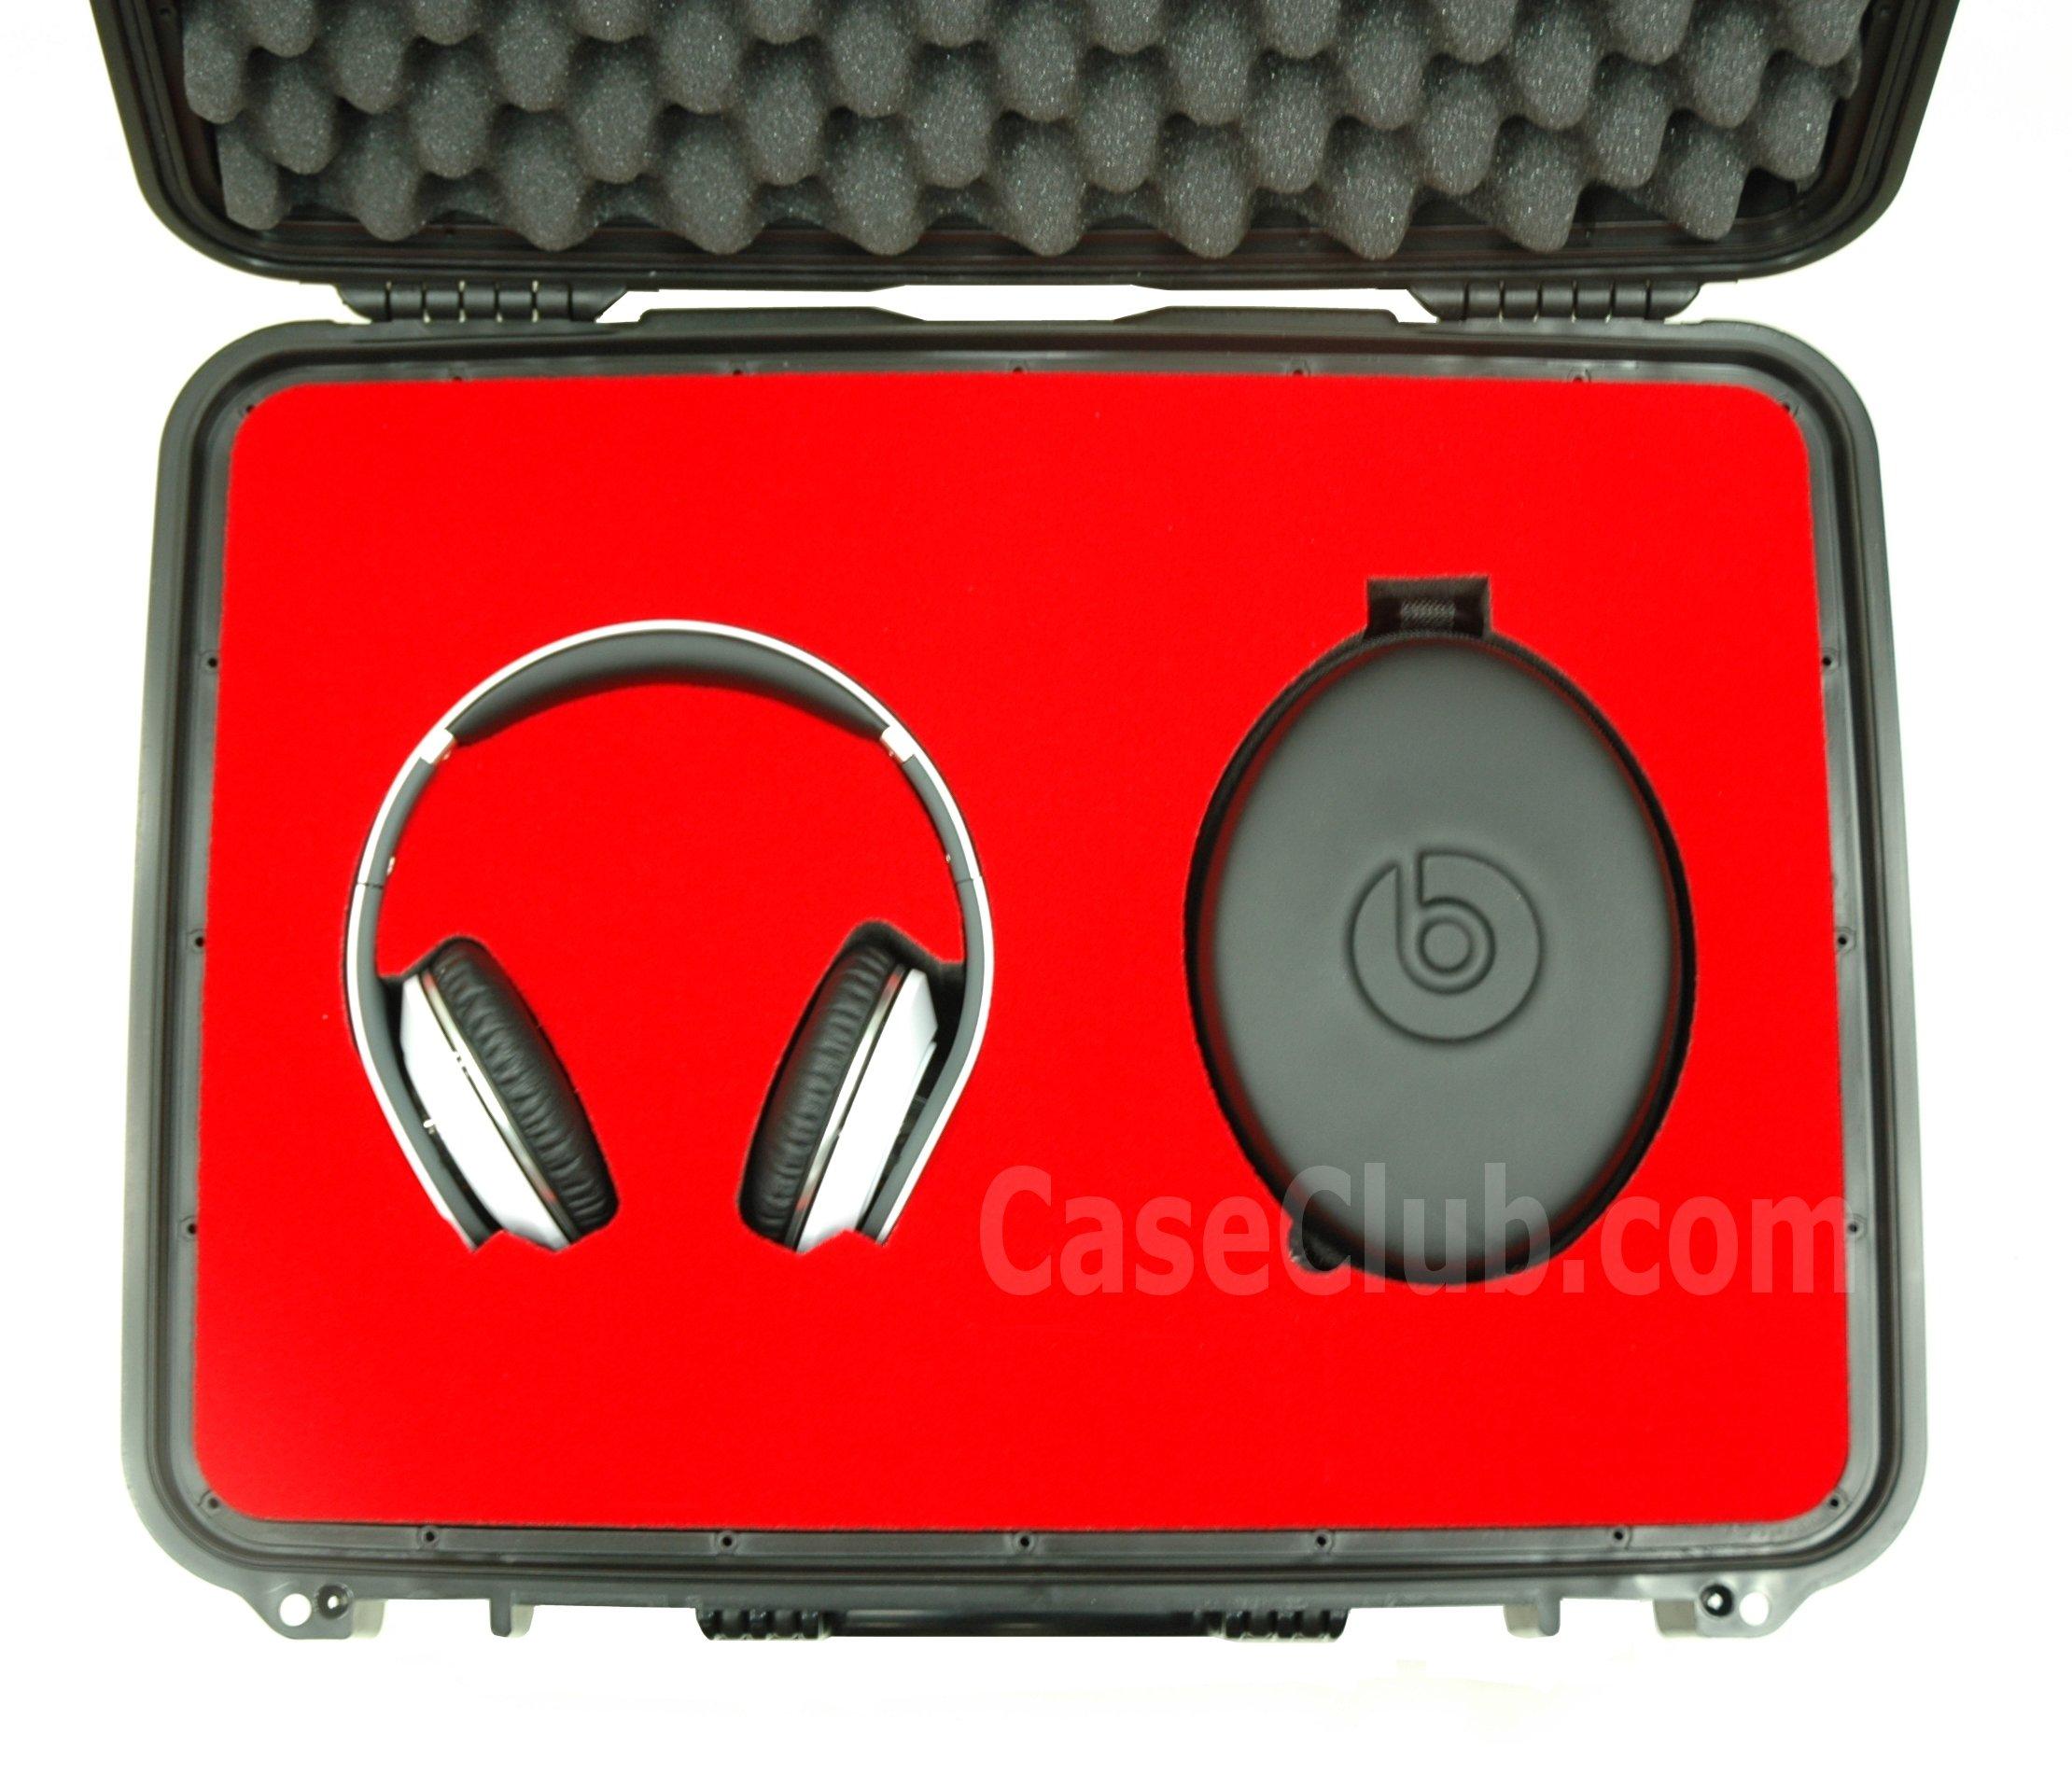 Seahorse 720 Case Custom Foam Example: Beats By Dre Headphone Case